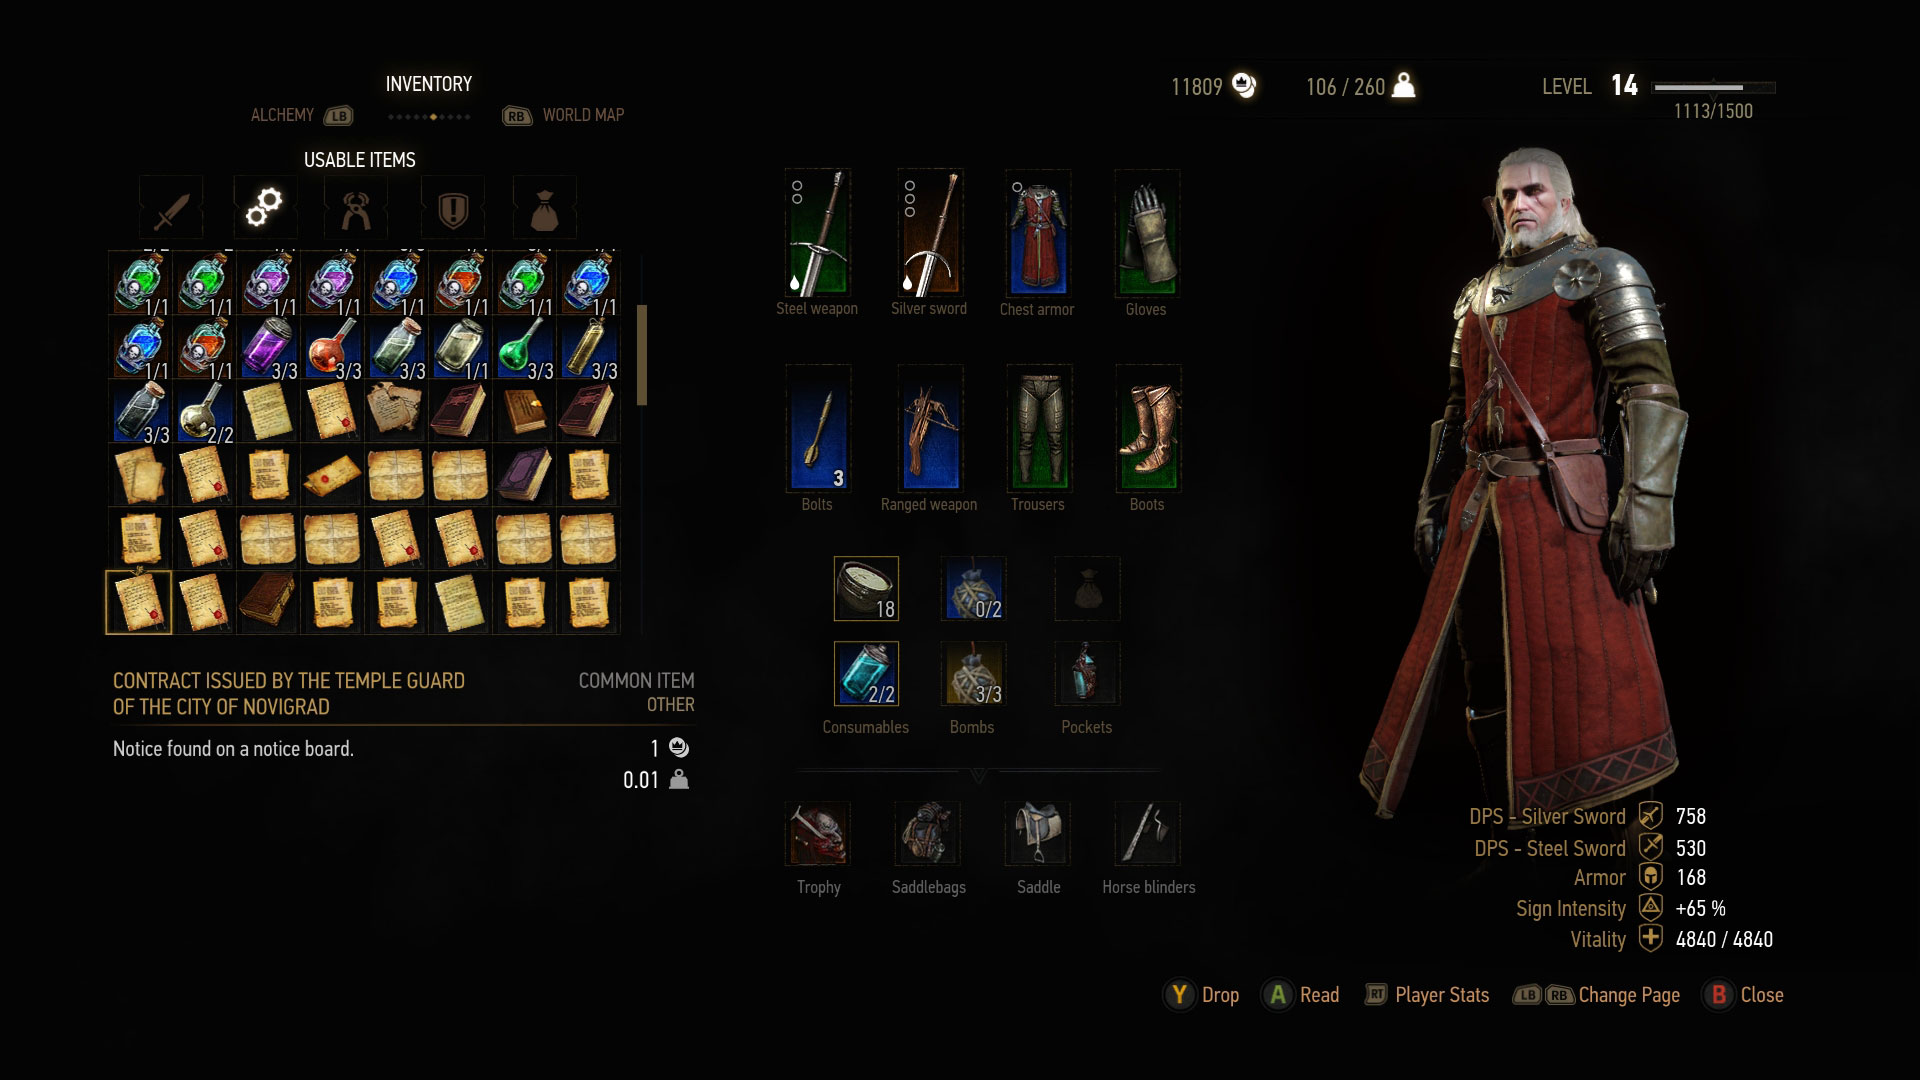 The Witcher 3: Wild Hunt inventario